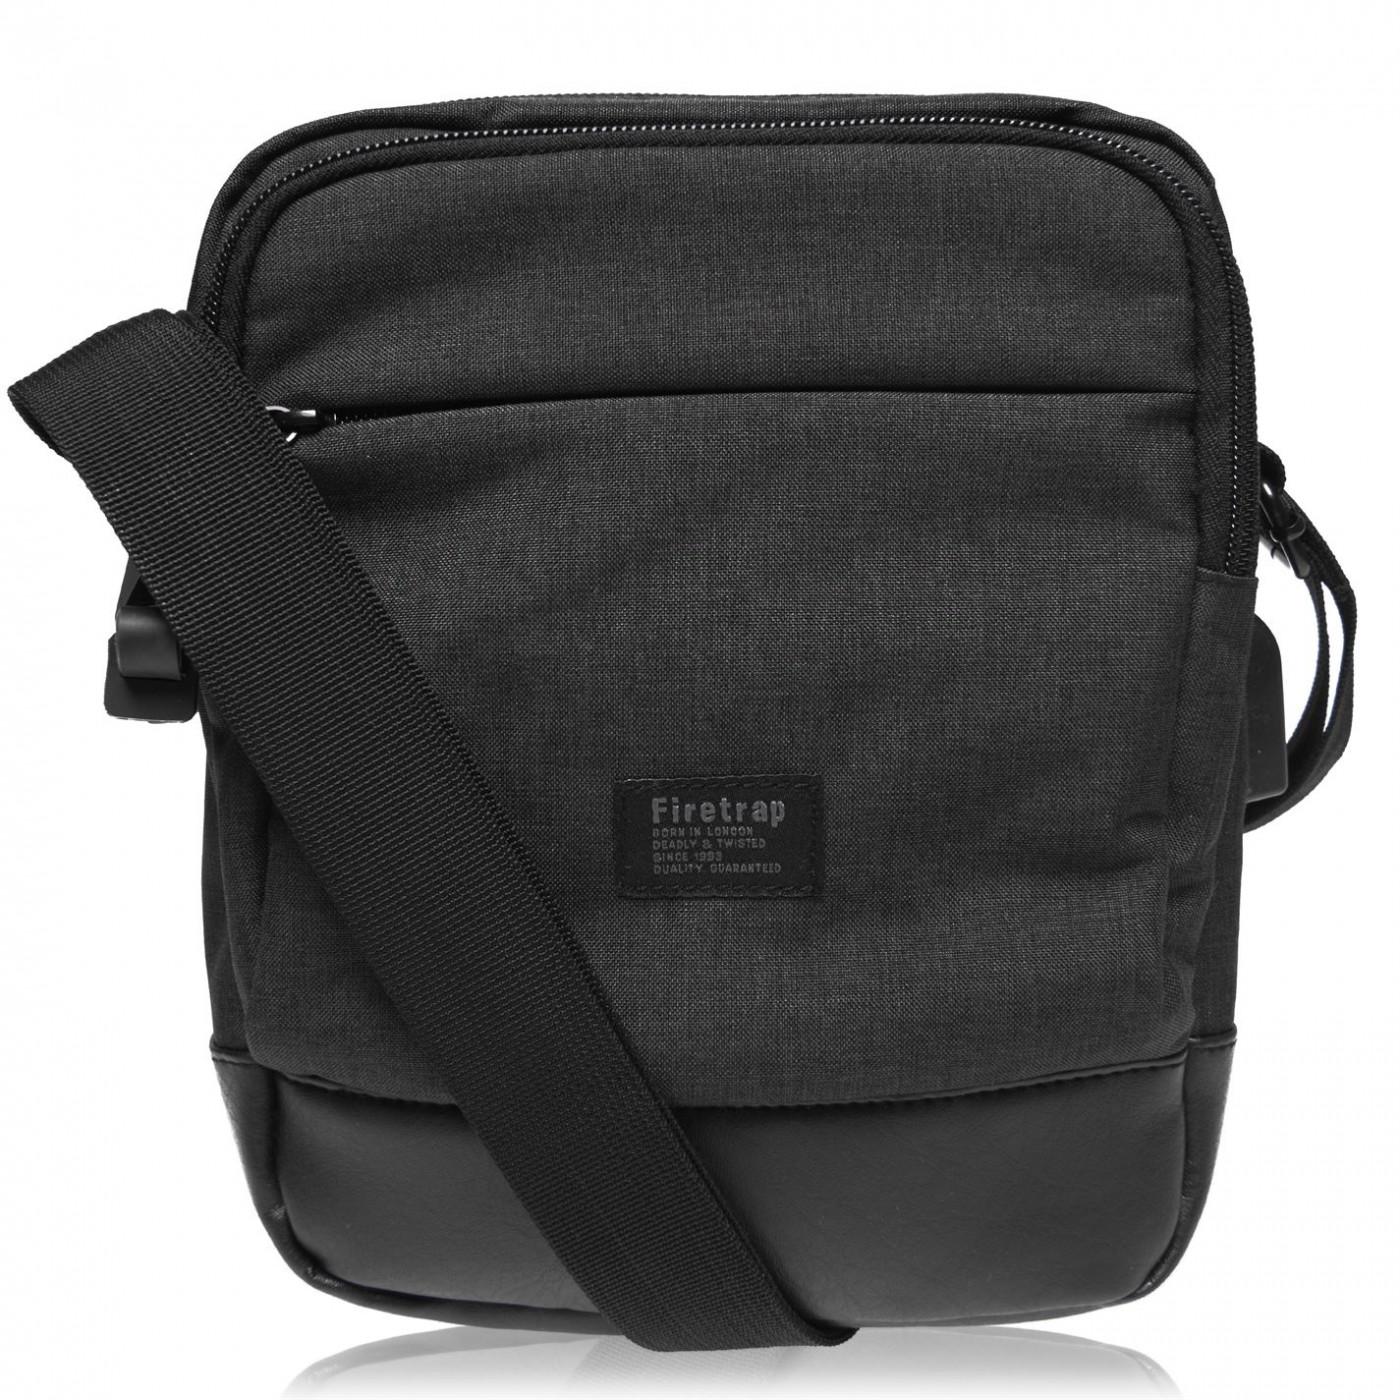 Firetrap Kingdom Cross Body Bag